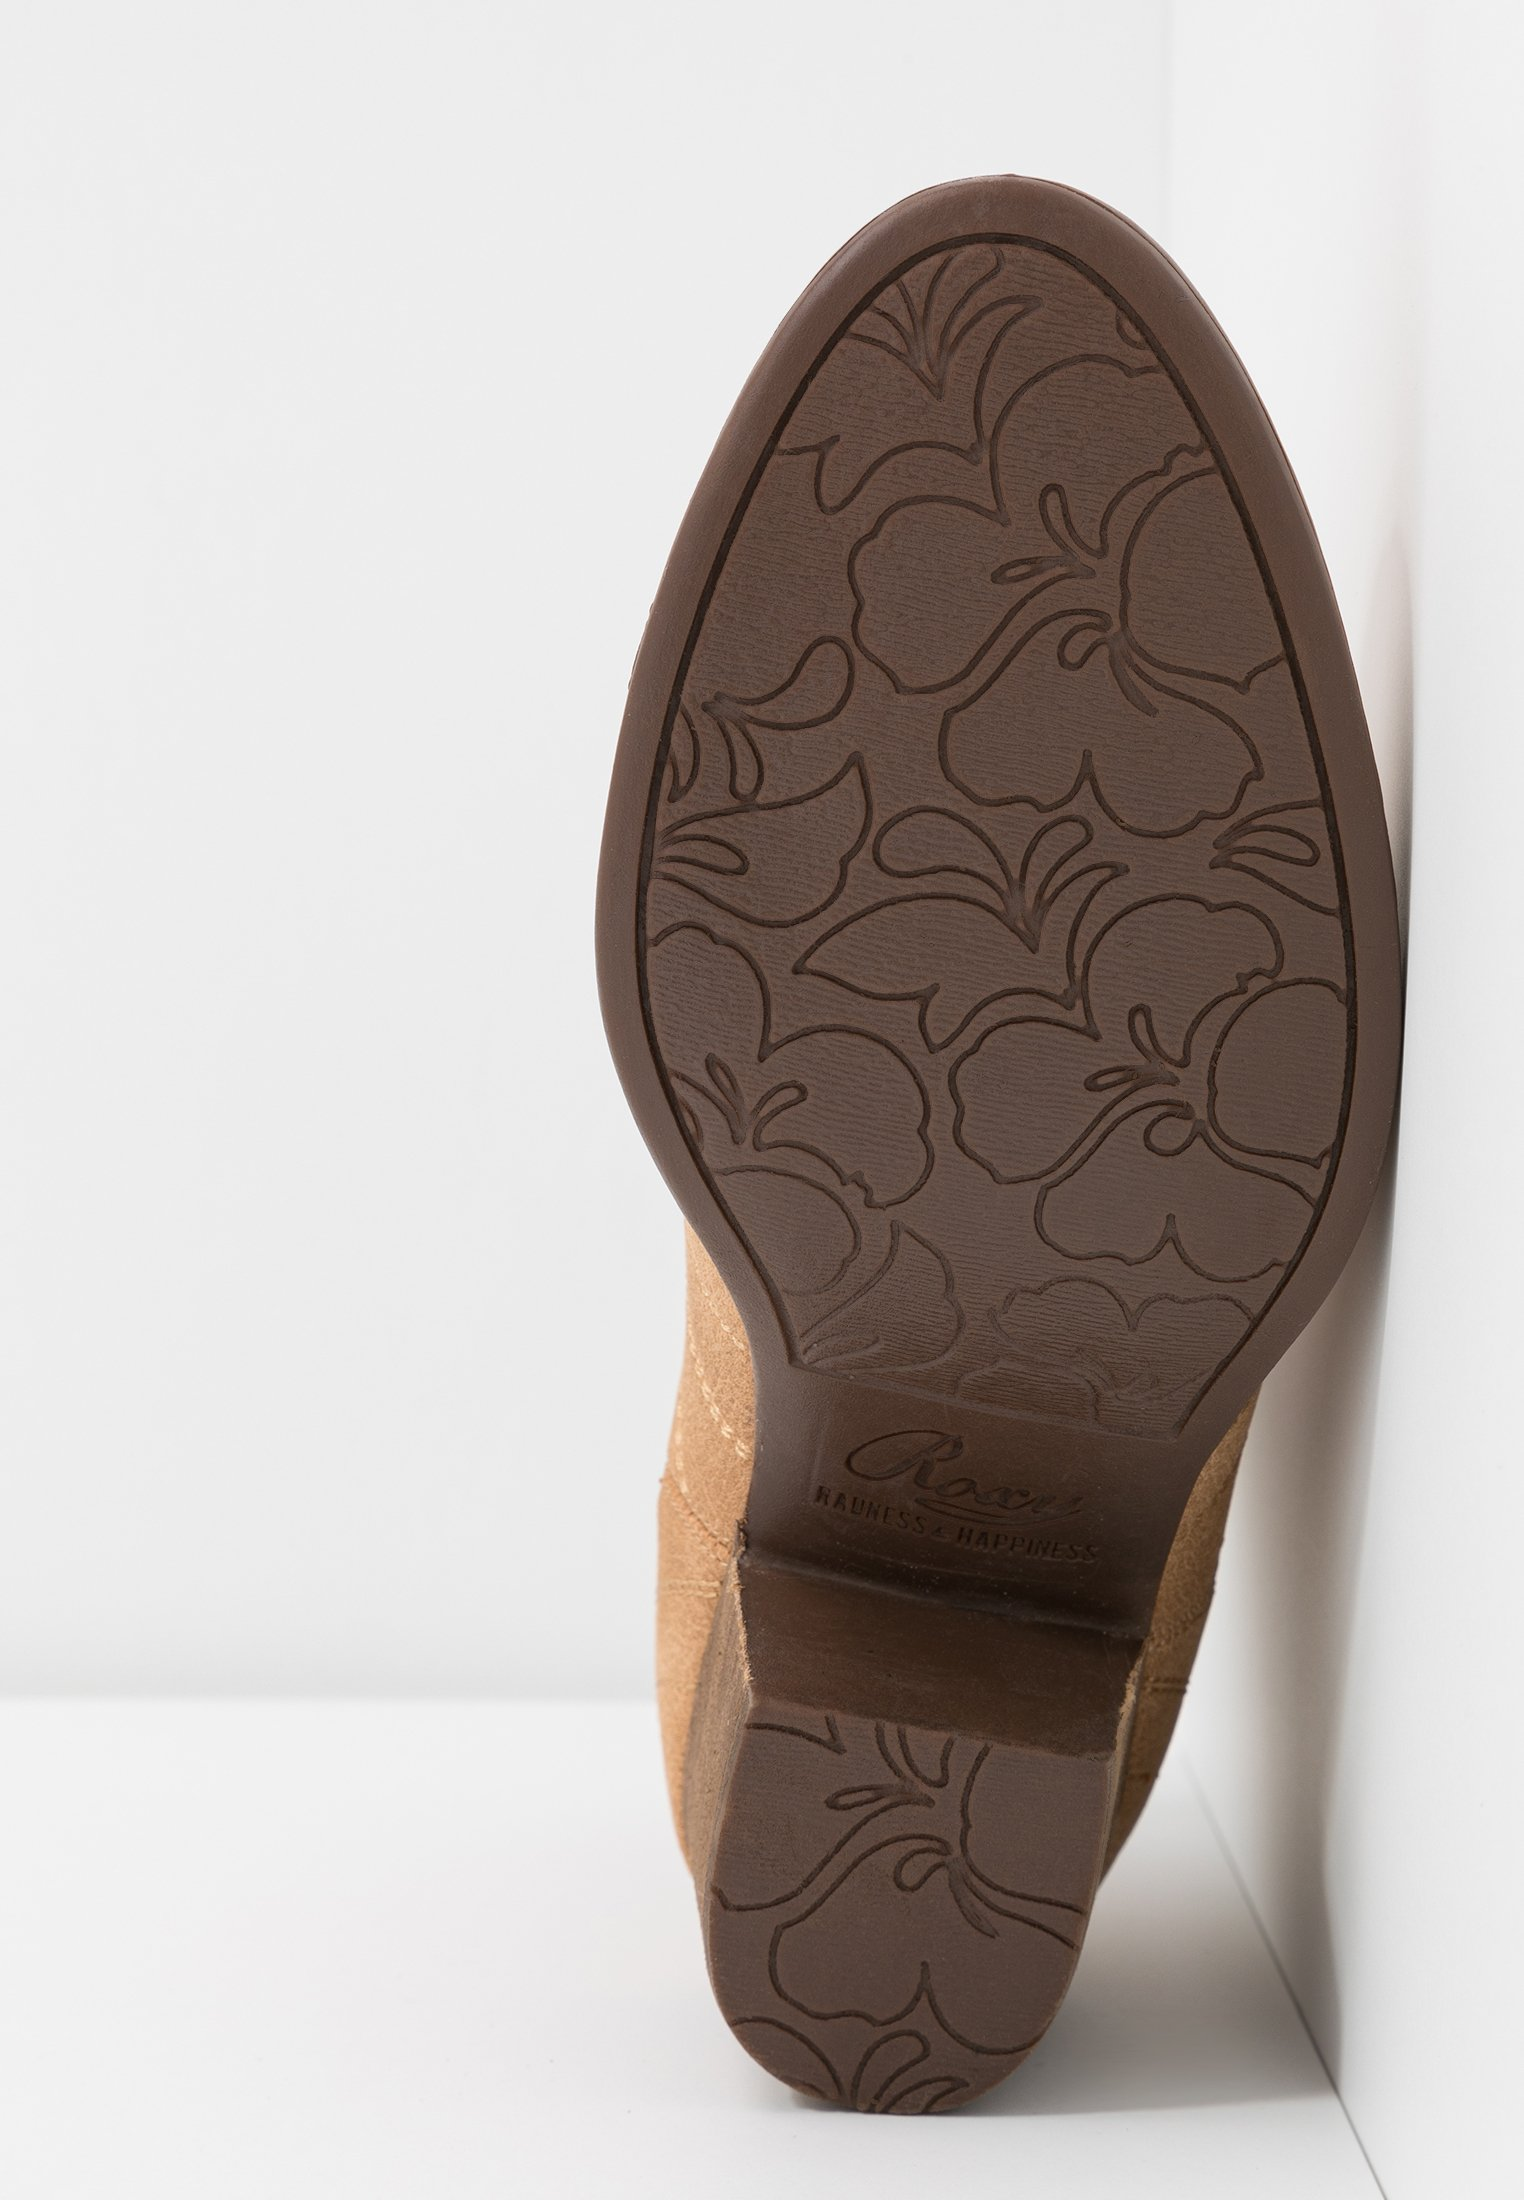 Roxy RANDALL BOOT - Bottines tan